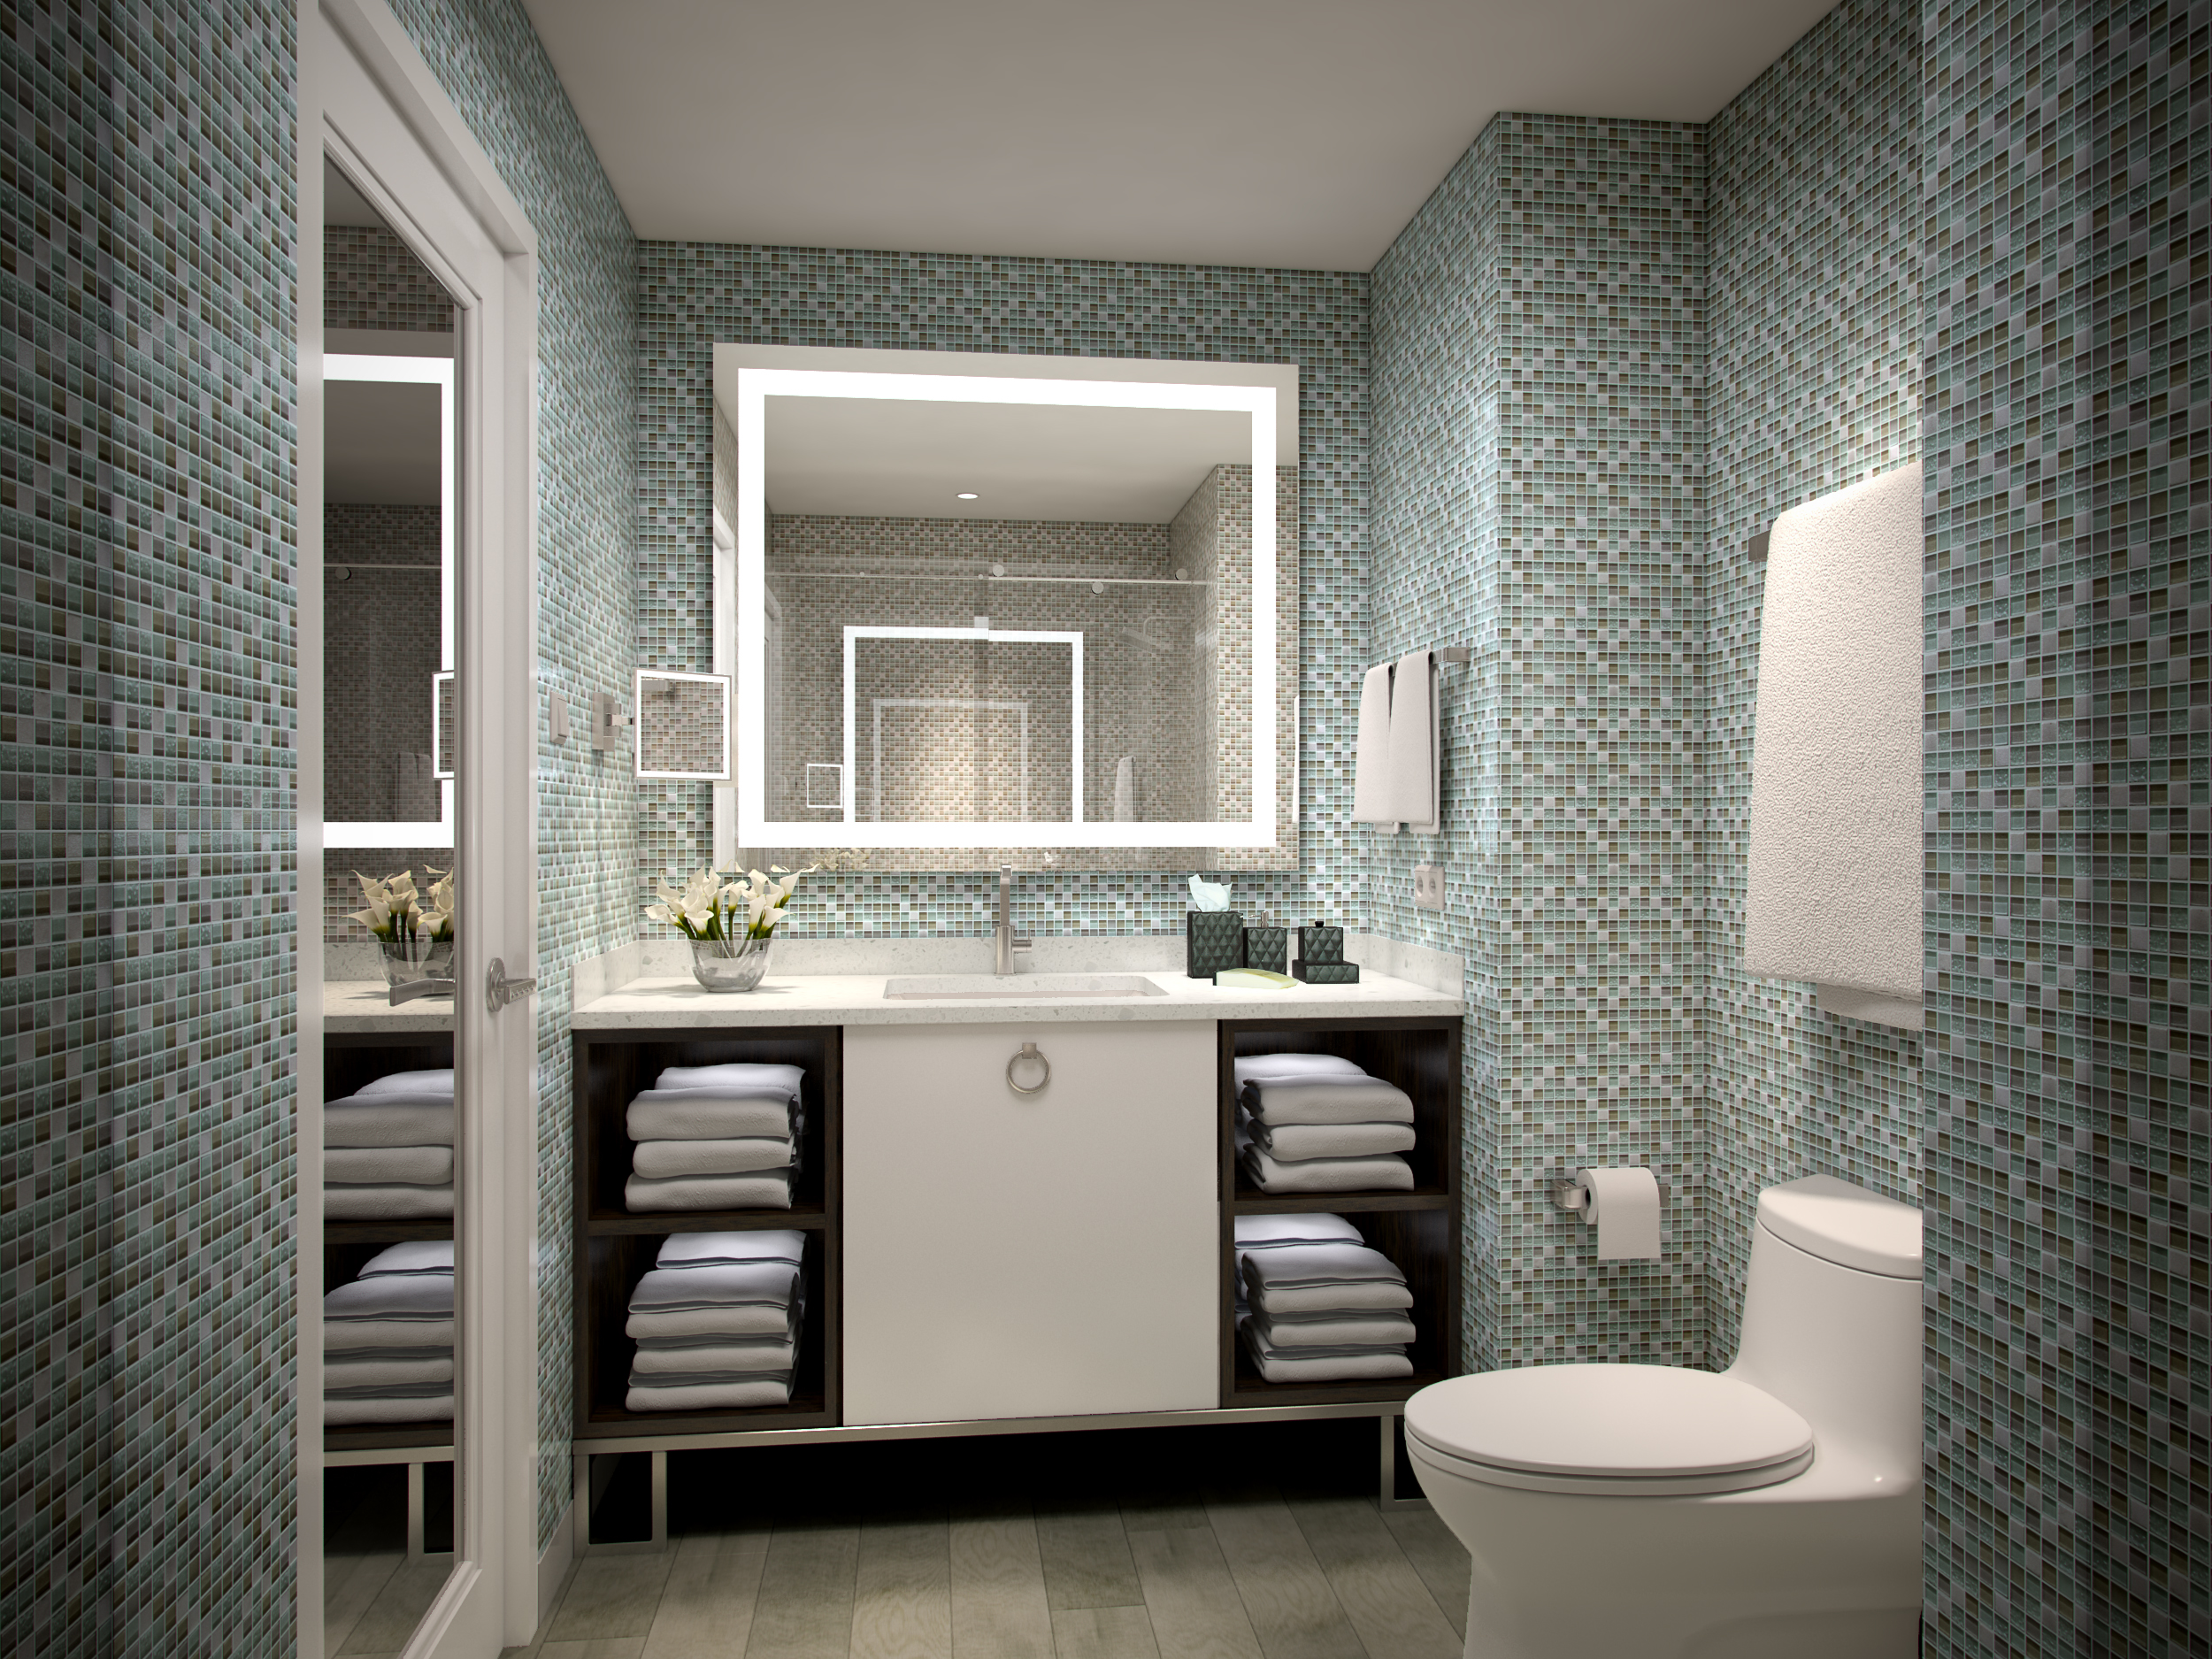 HOTEL ROOM BATHROOM R3